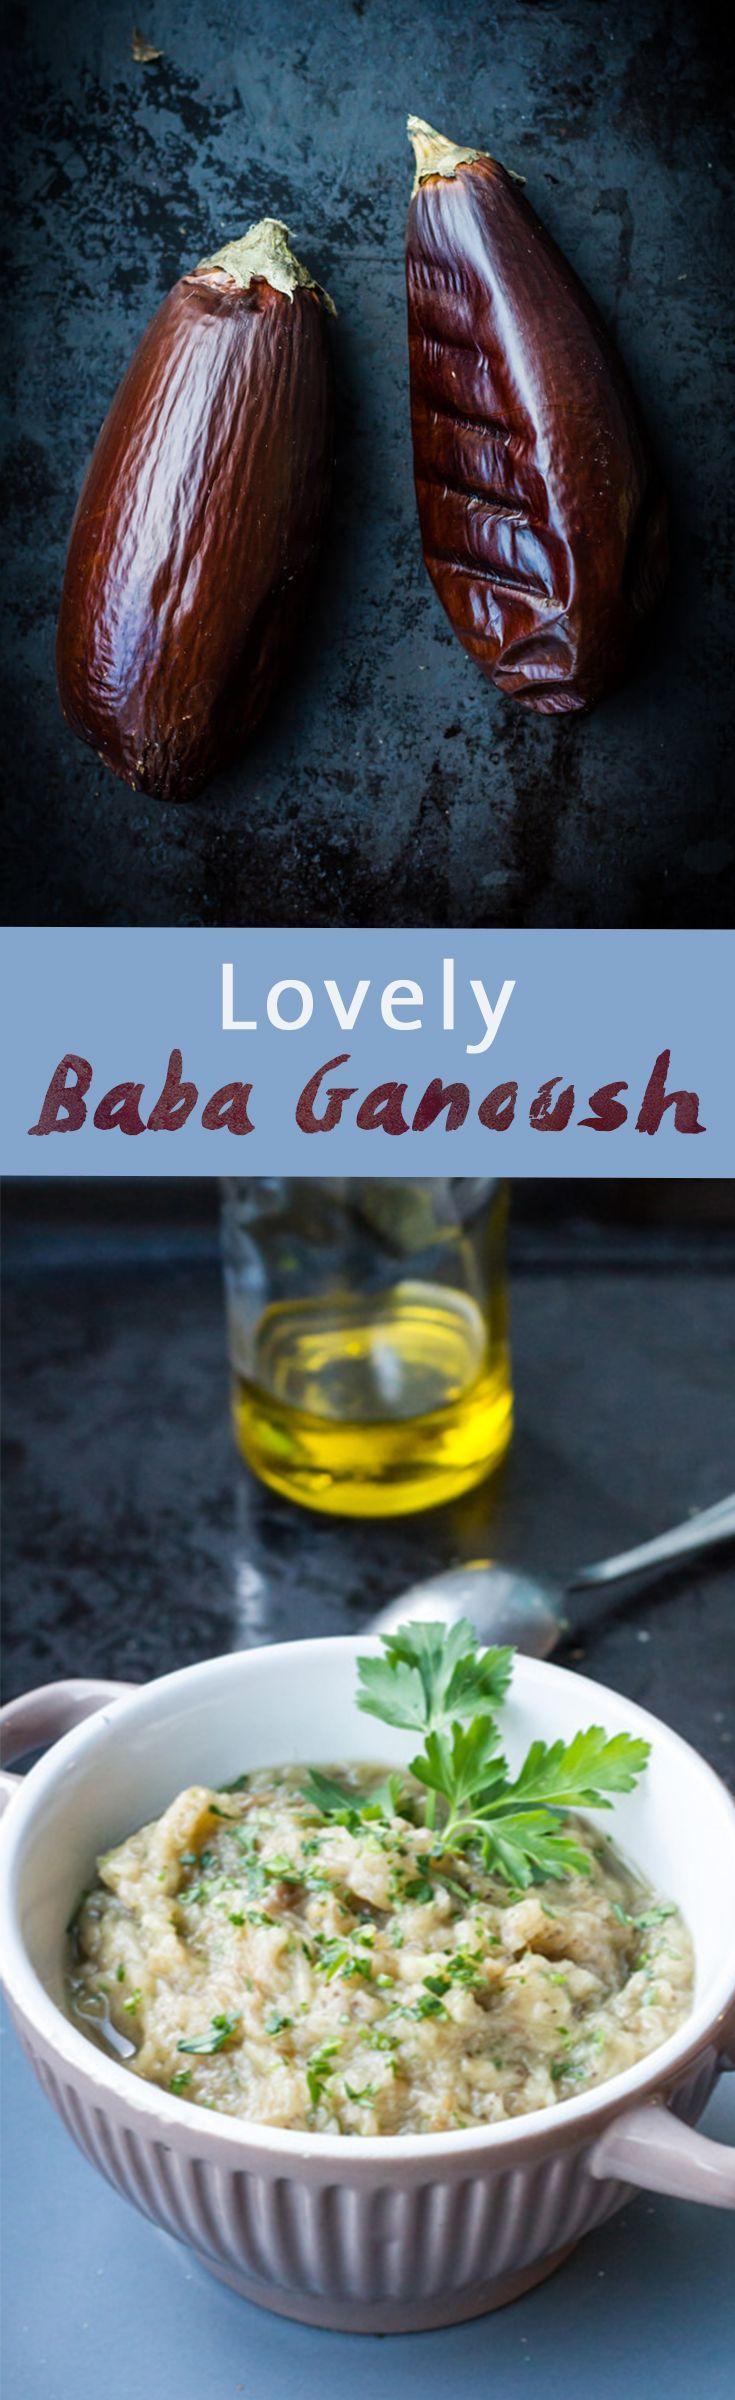 Lovely Baba Ganoush Recipe | Simple Eggplant, Garlic, Lemon and Olive oil recipe | www.haveanotherbite.com | #recipe #yum #arabic